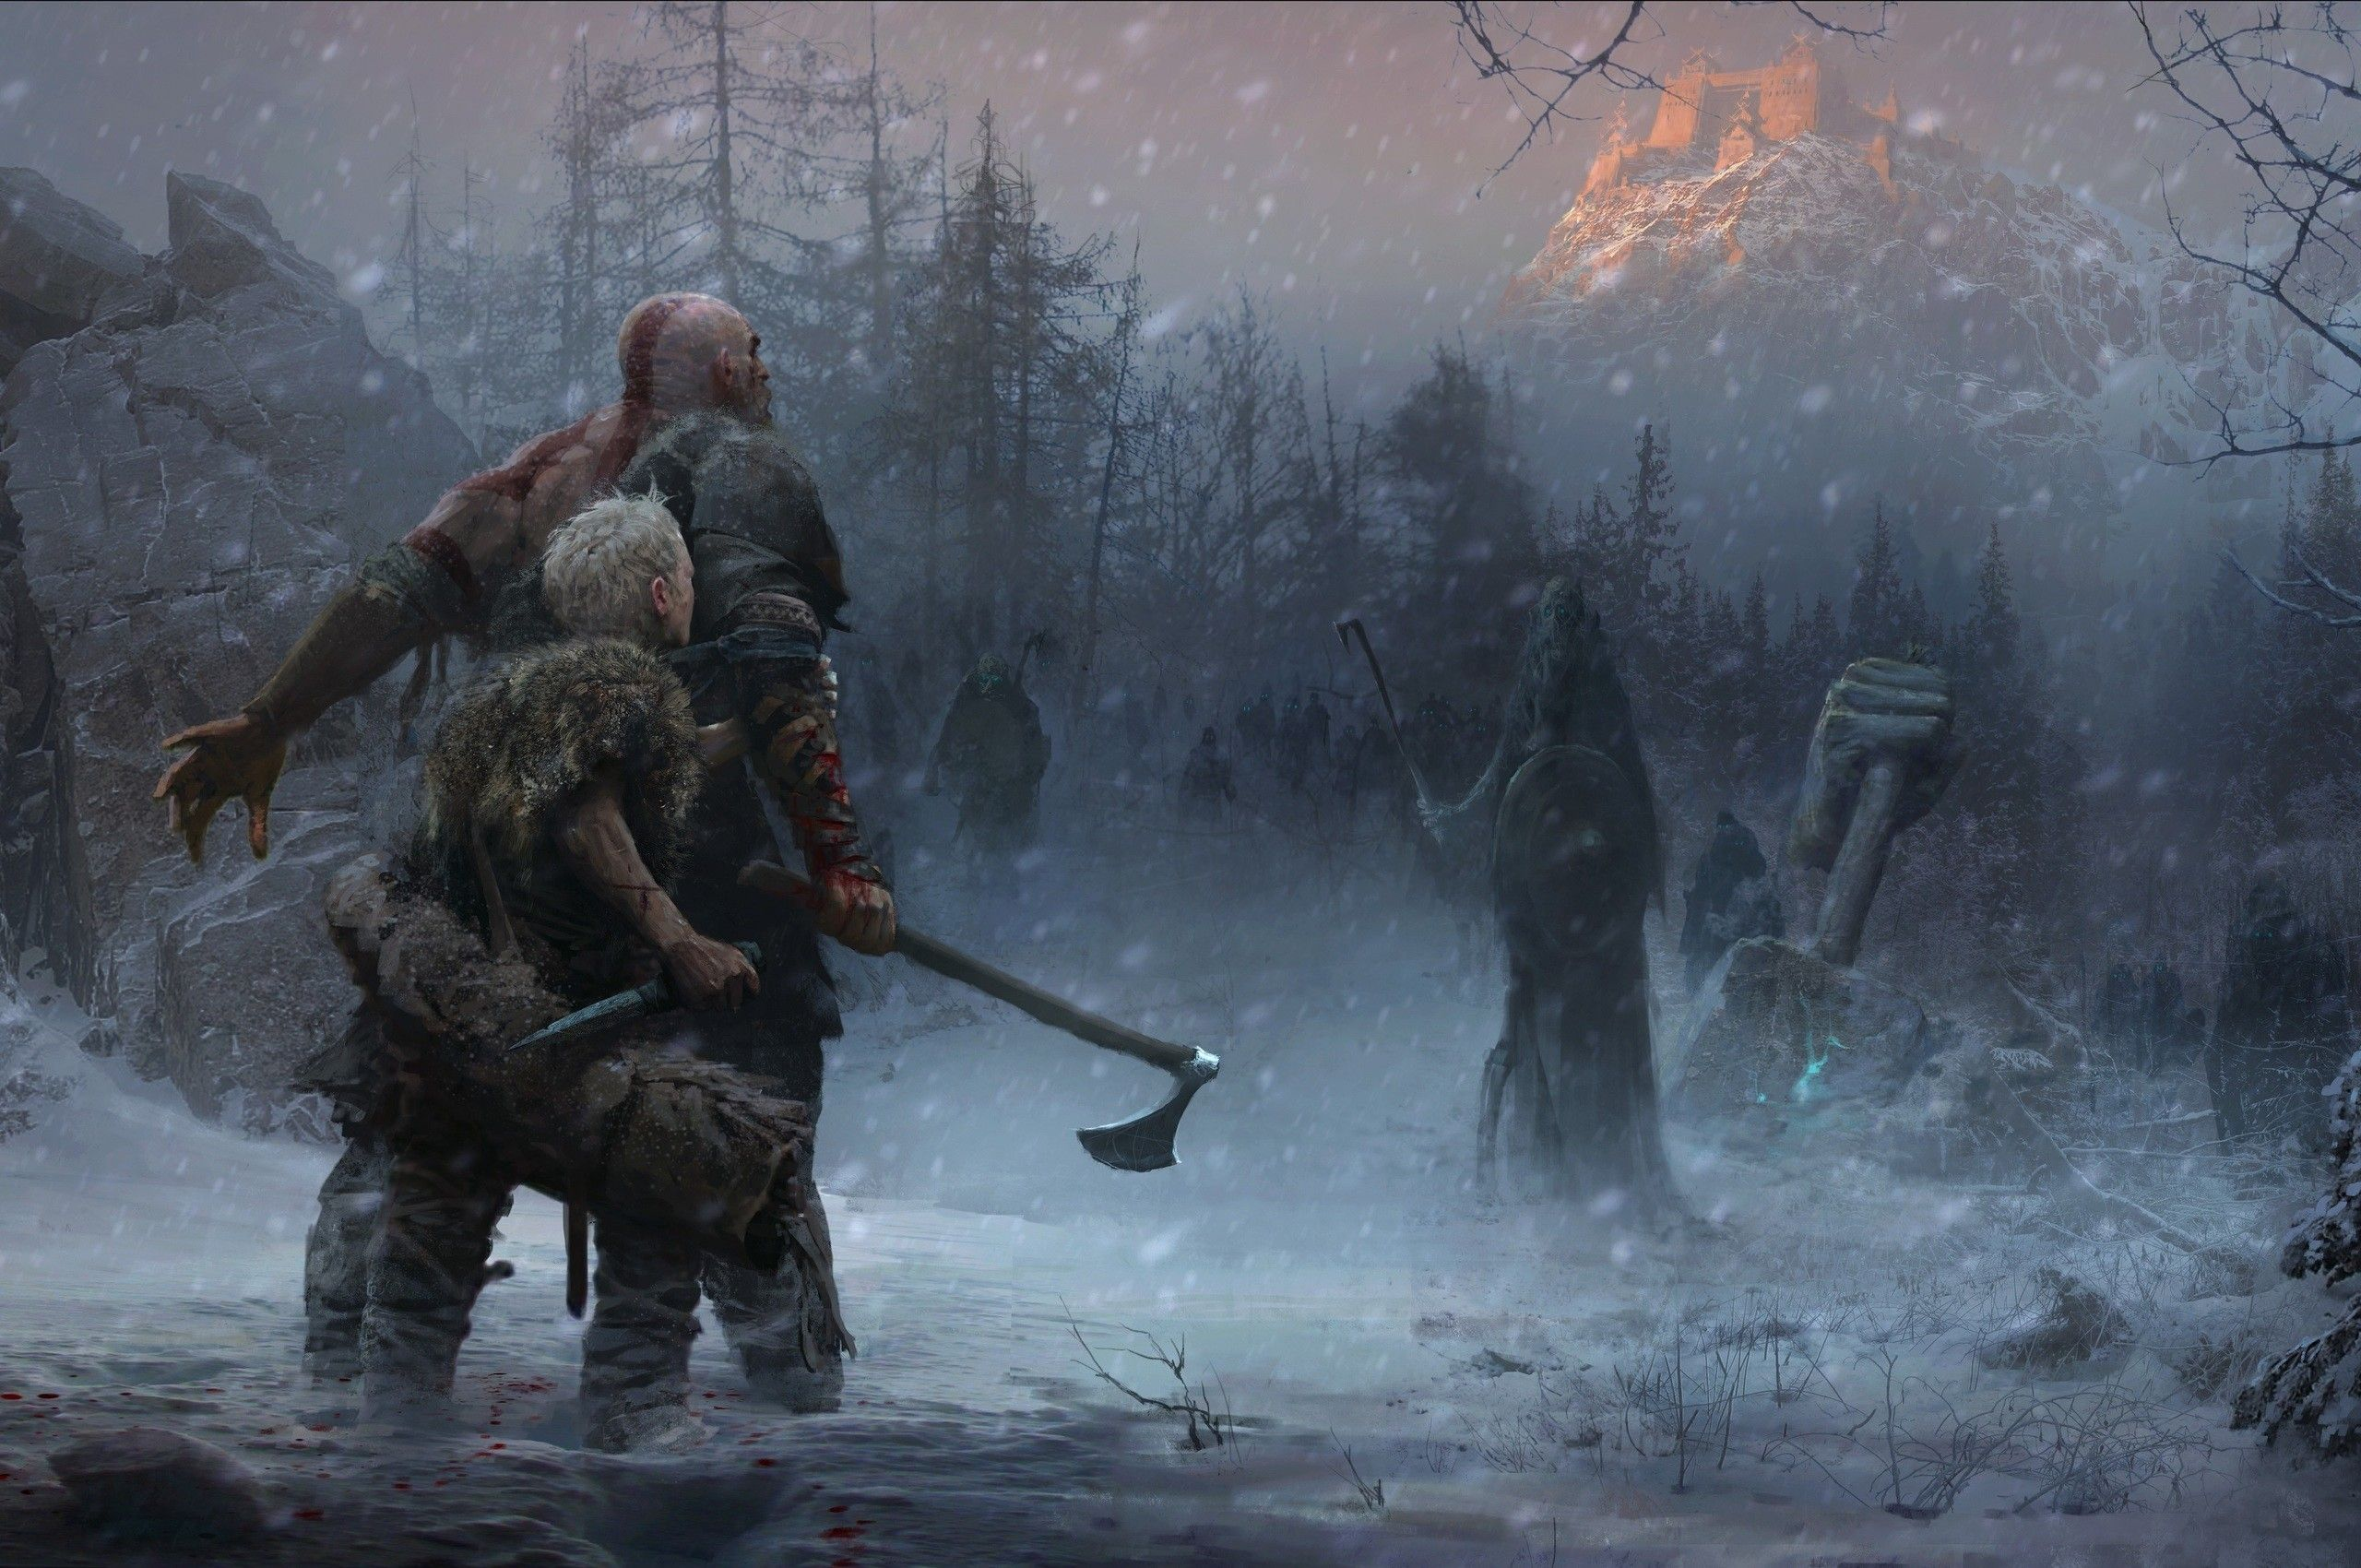 Viking Battle Wallpapers Top Free Viking Battle Backgrounds Wallpaperaccess